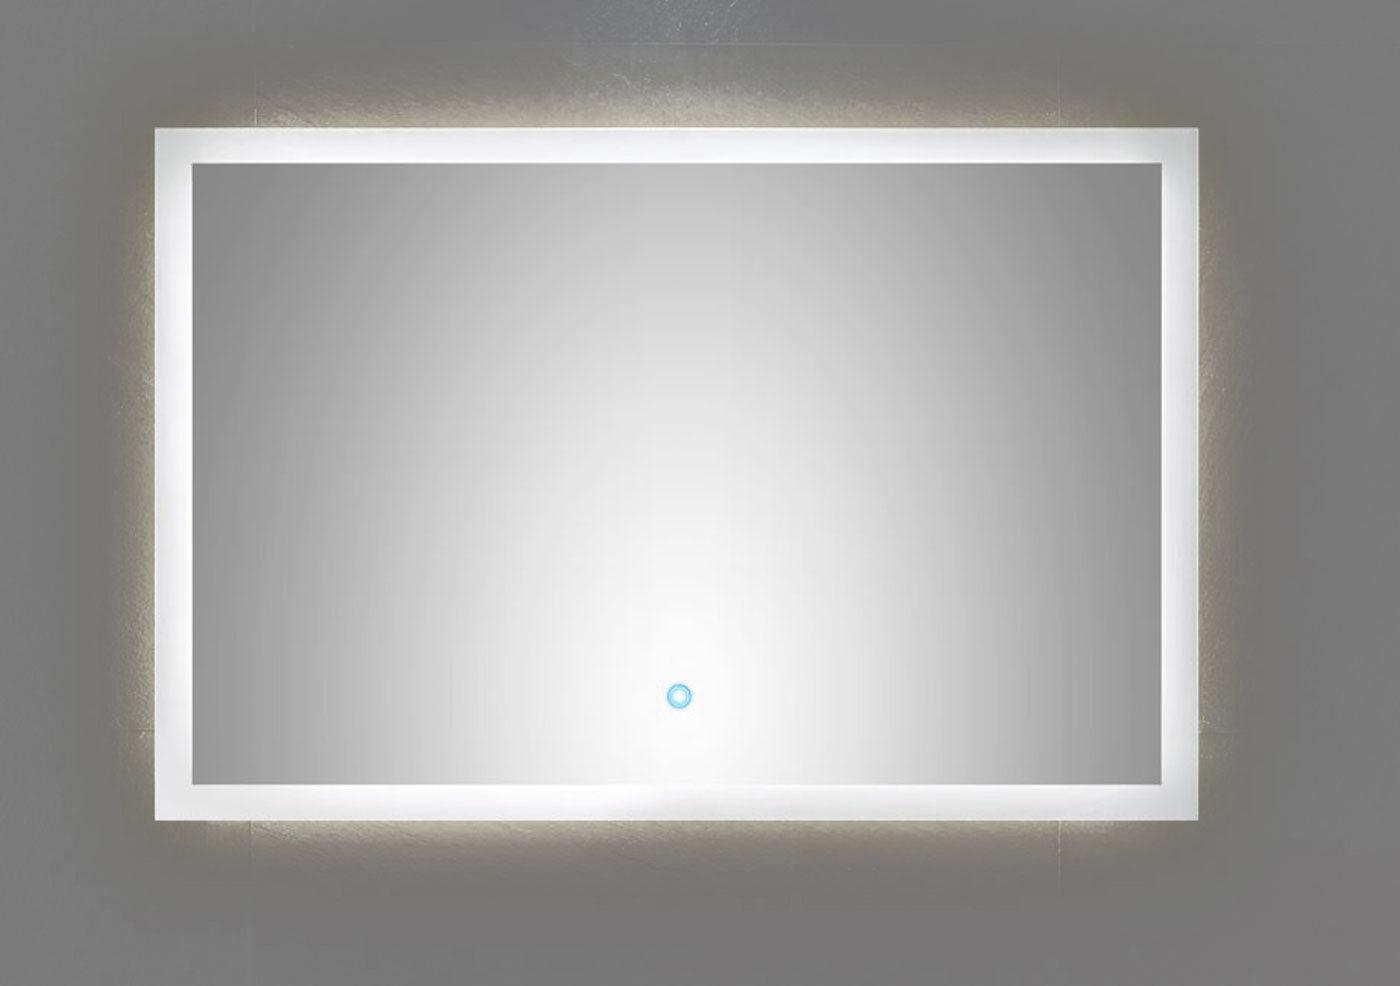 Badezimmer Wand LED Spiegel EMOTION 90 x 60 cm Touch Bedienung 34 W ...